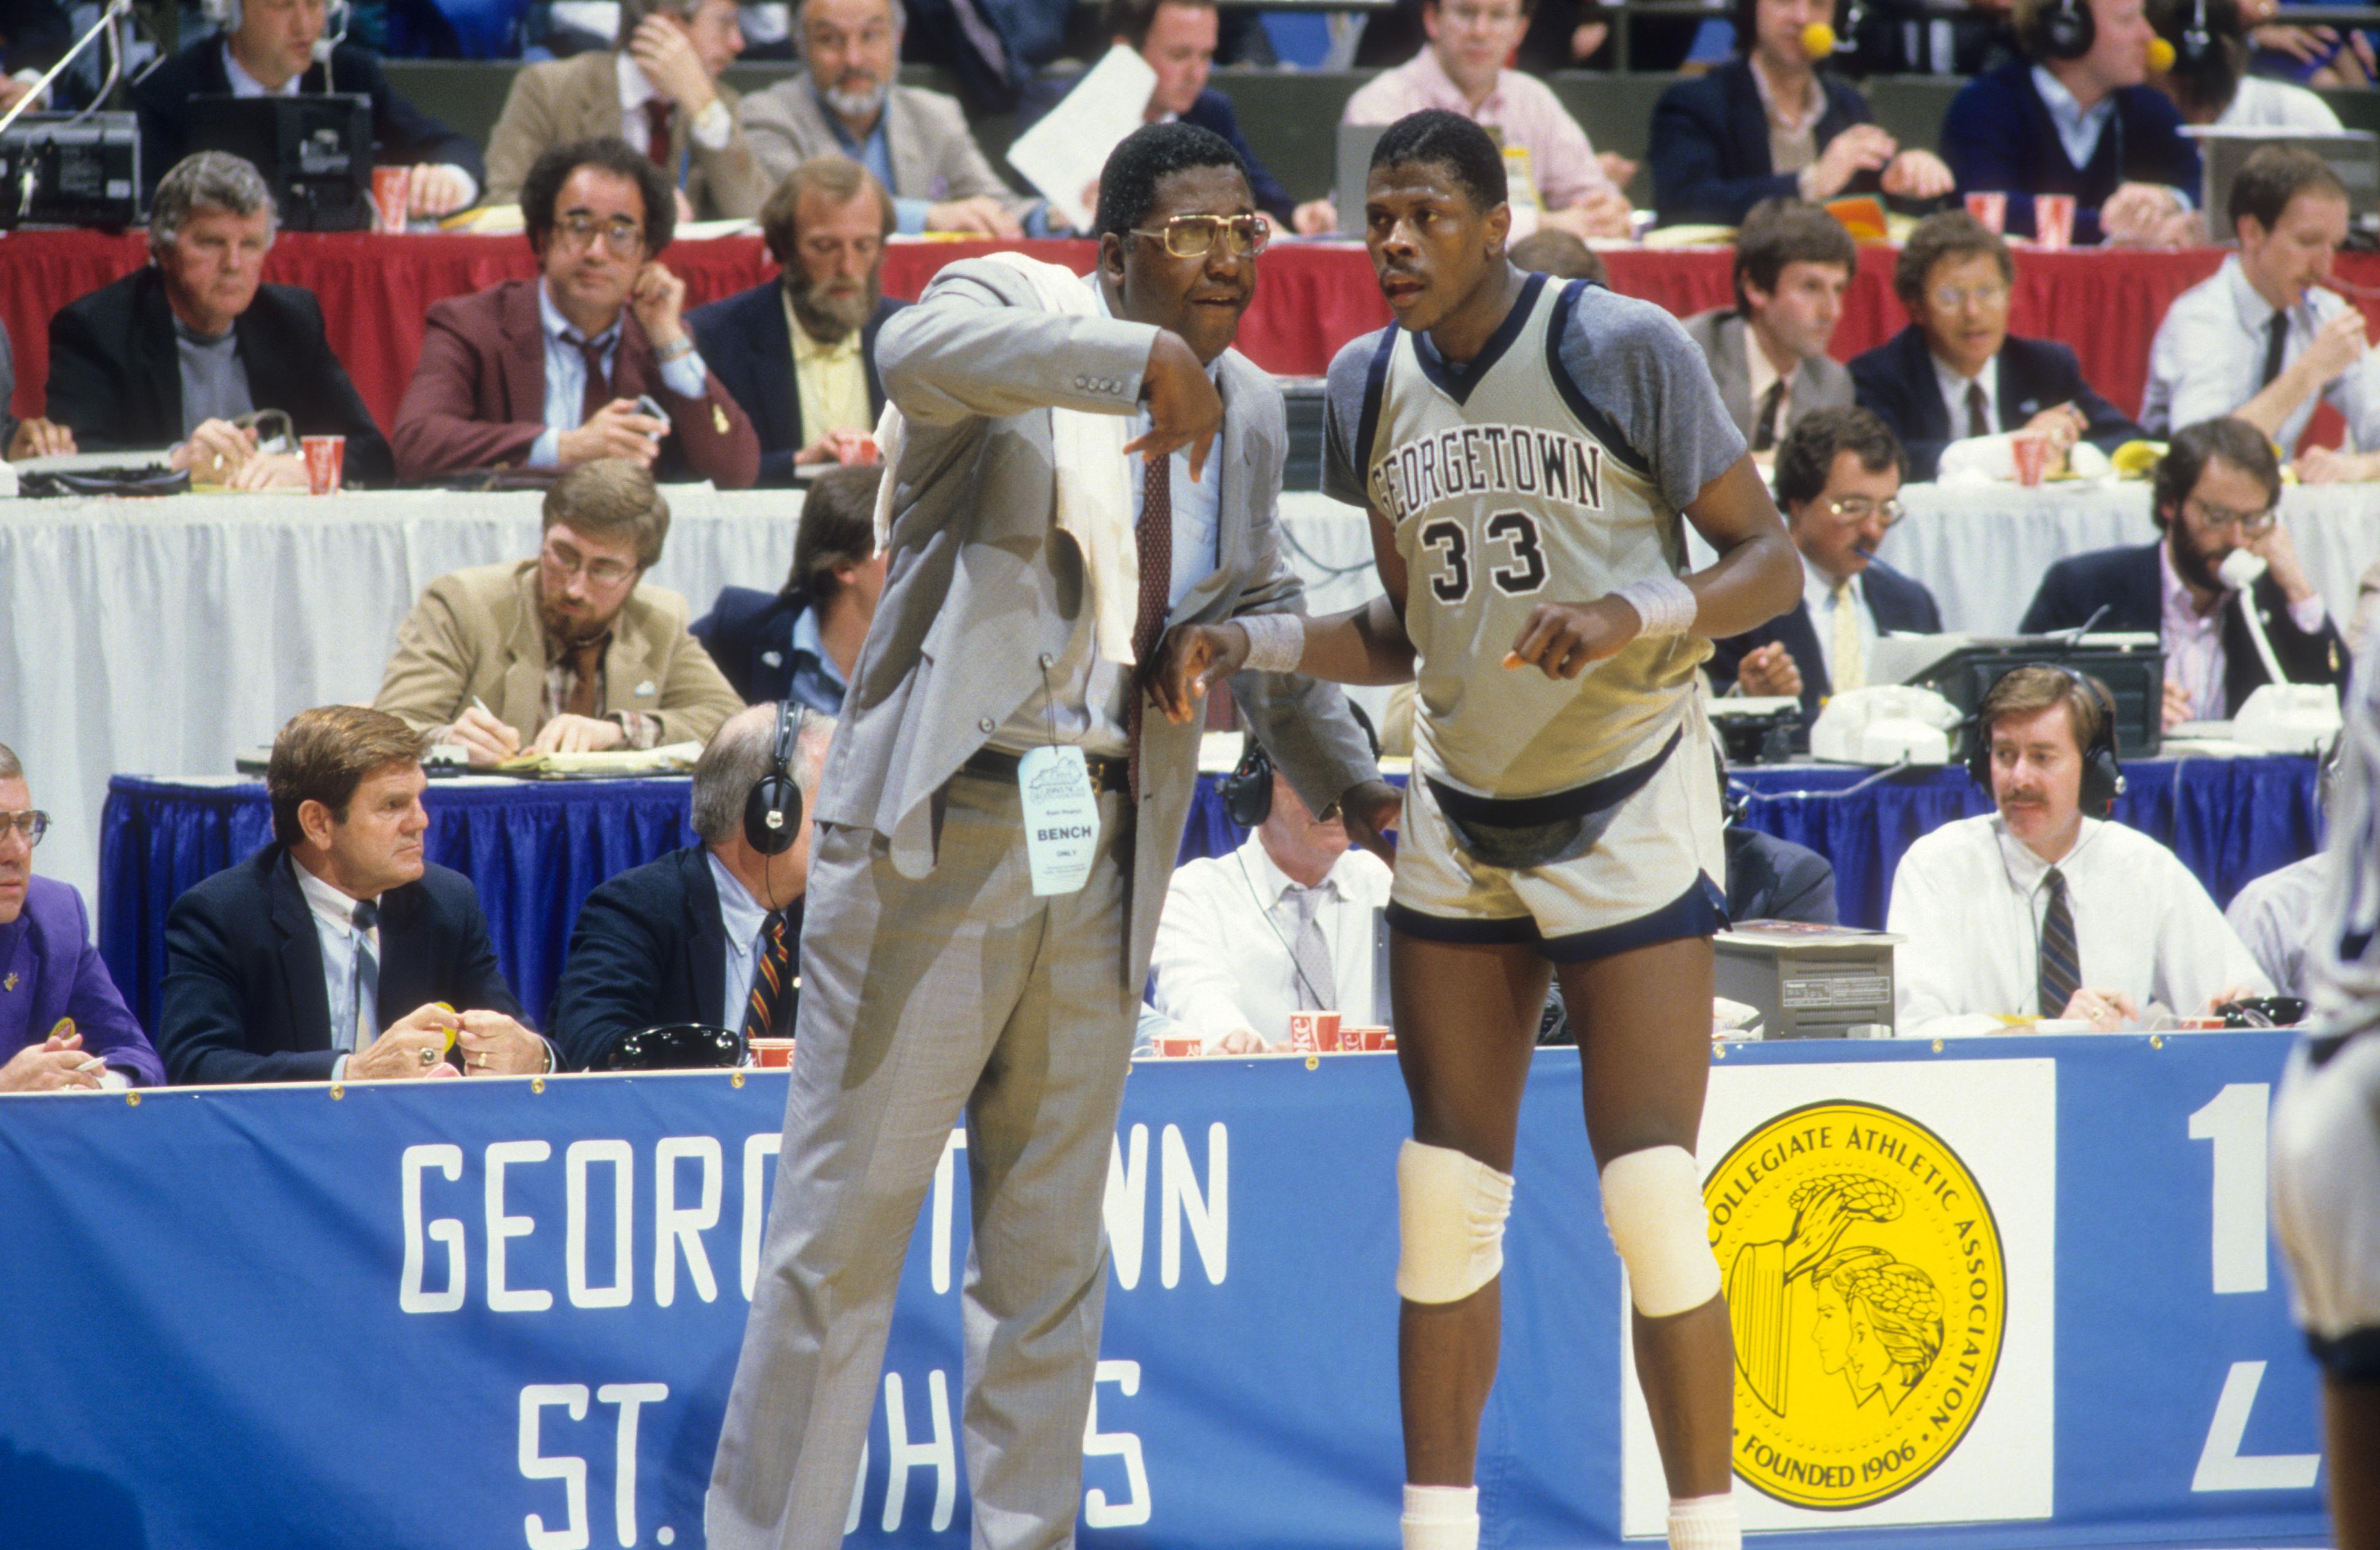 Georgetown University vs Villanova University, 1985 NCAA Finals